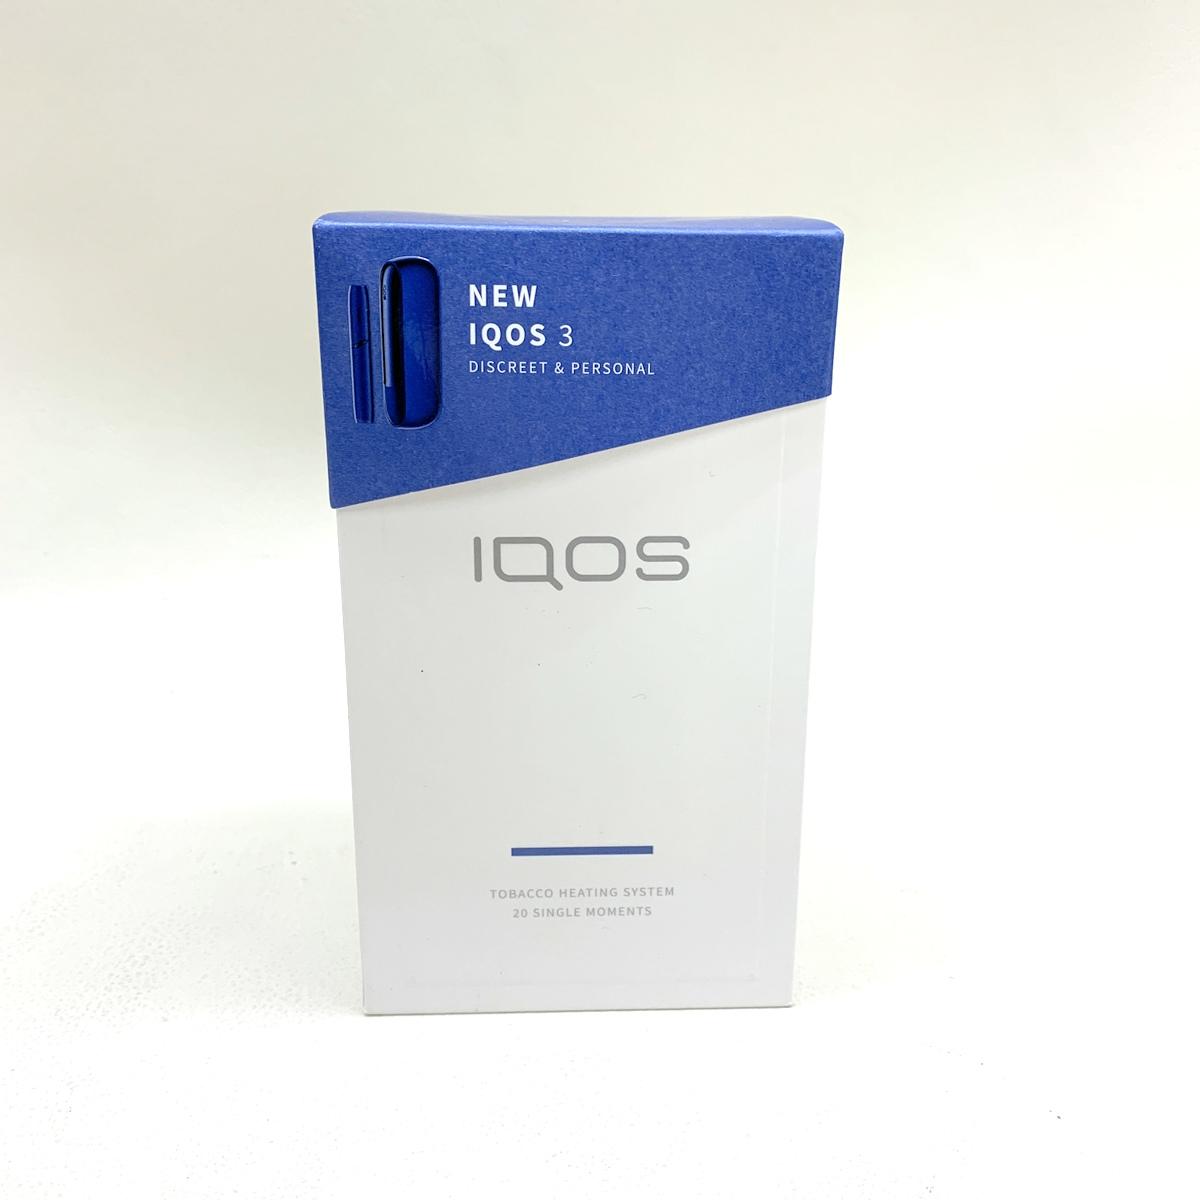 iQOS 3 買取 福井県越前市 鯖江市 出張 出張買取 サンステッププラス越前店